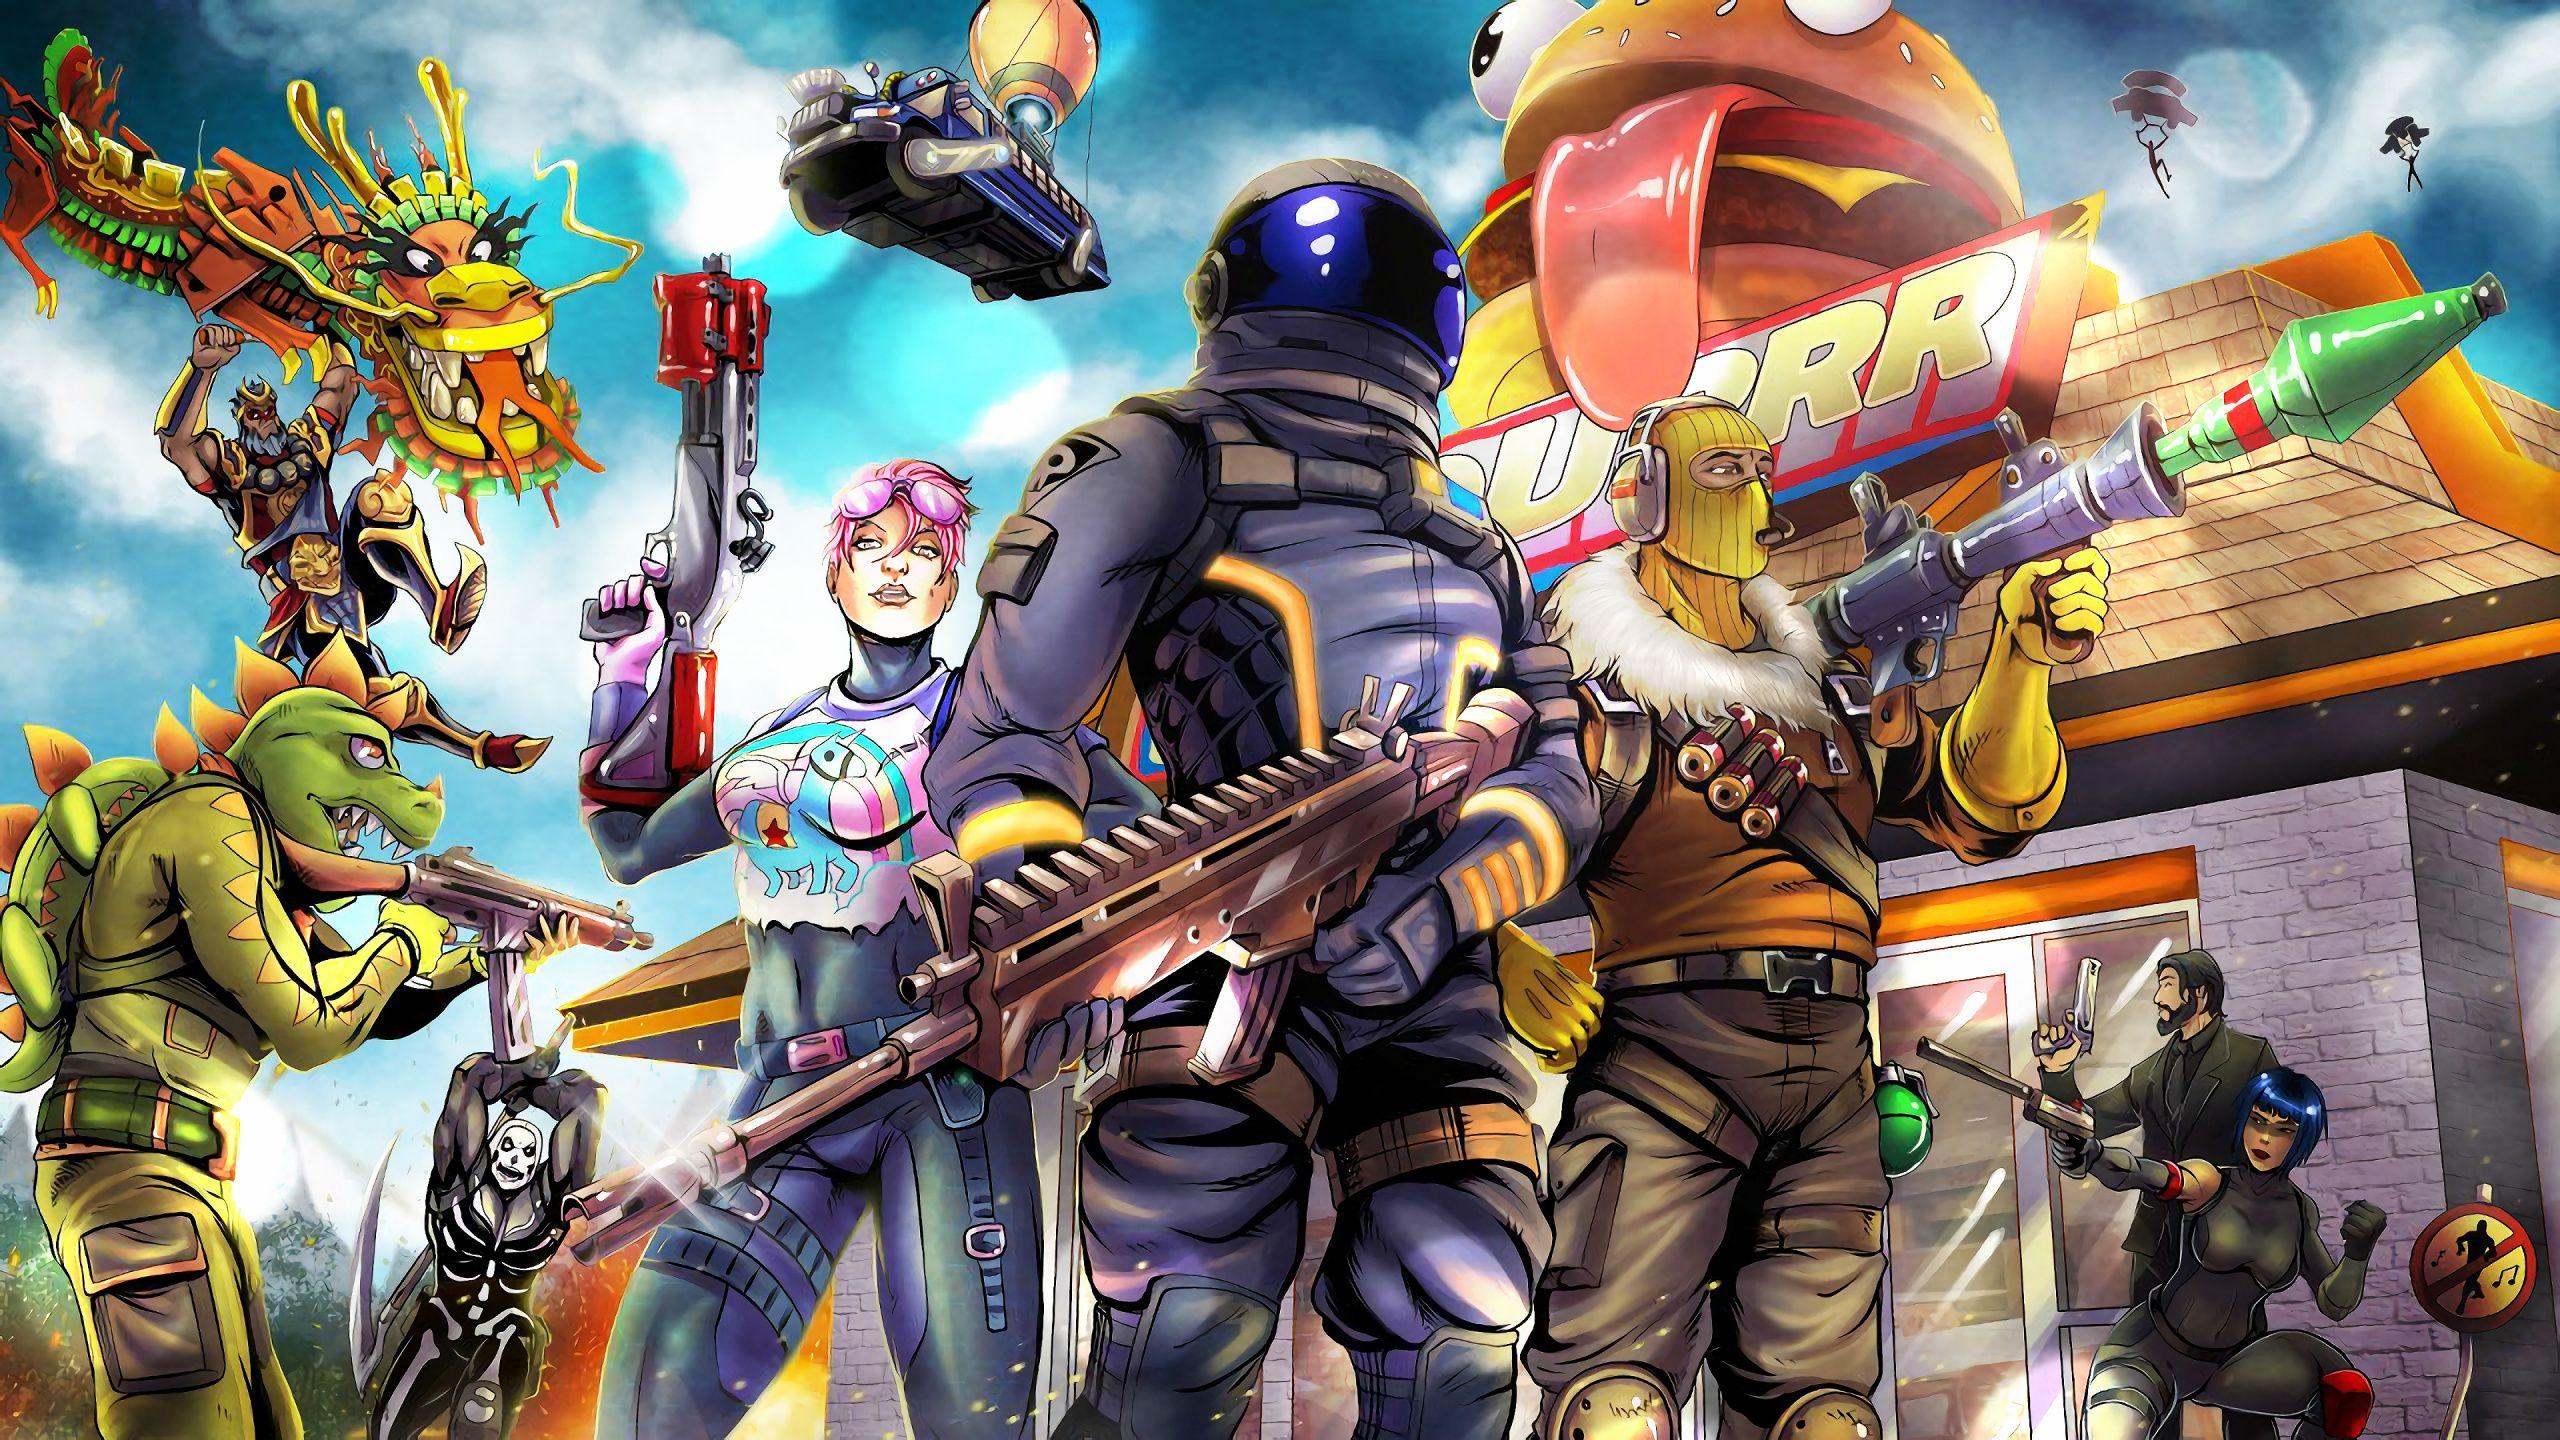 Download 2018, Video Game, Fortnite, Art, Wallpaper De